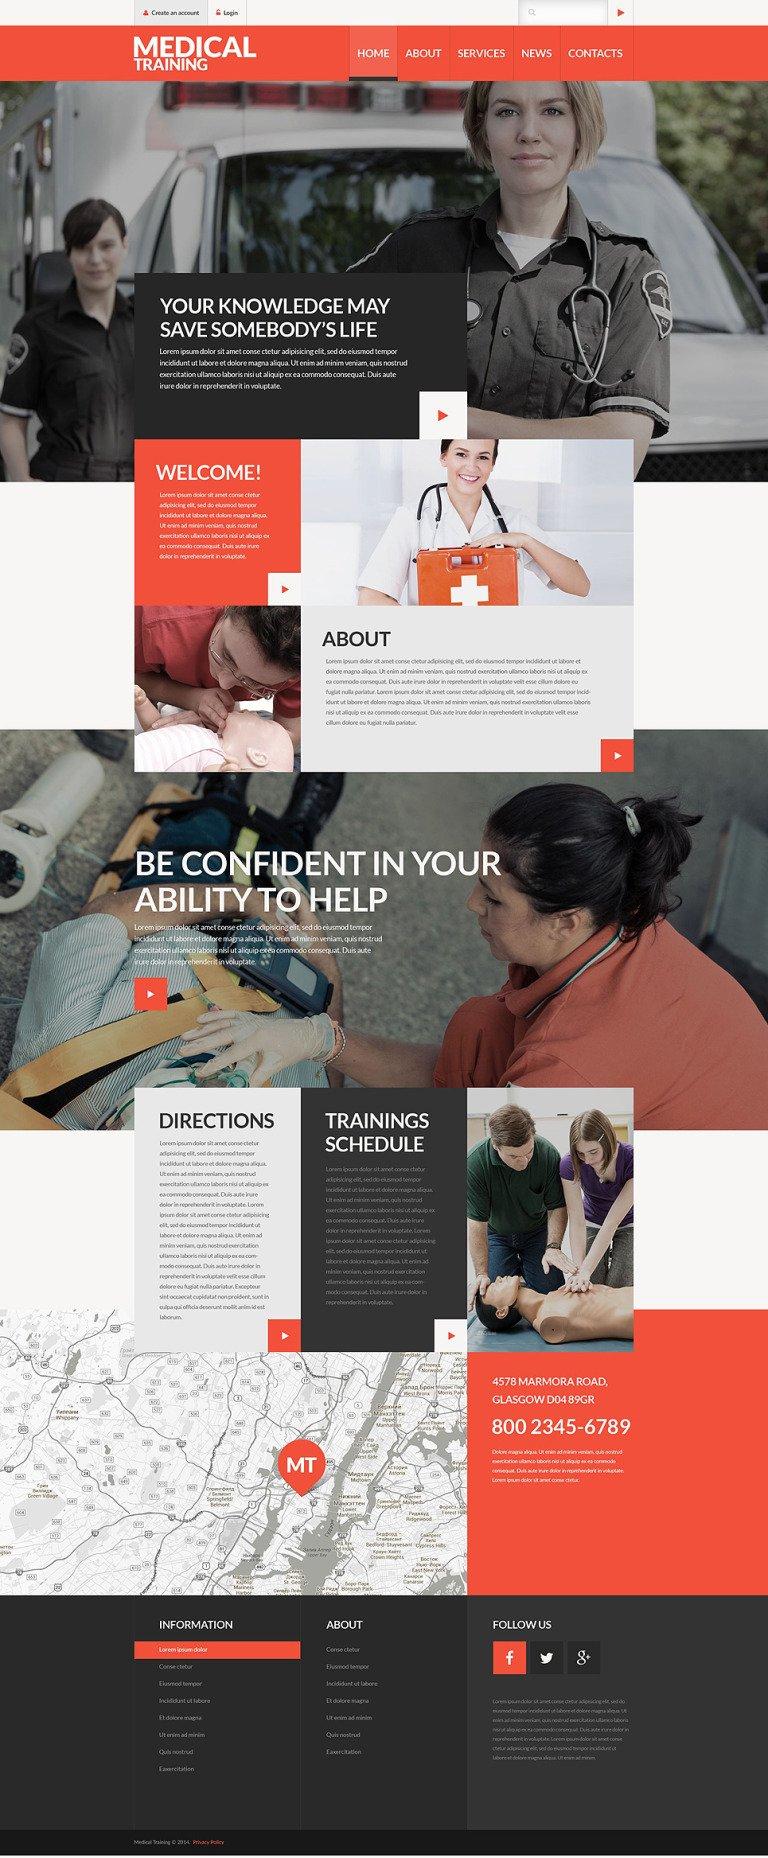 Medical Training School Website Template New Screenshots BIG